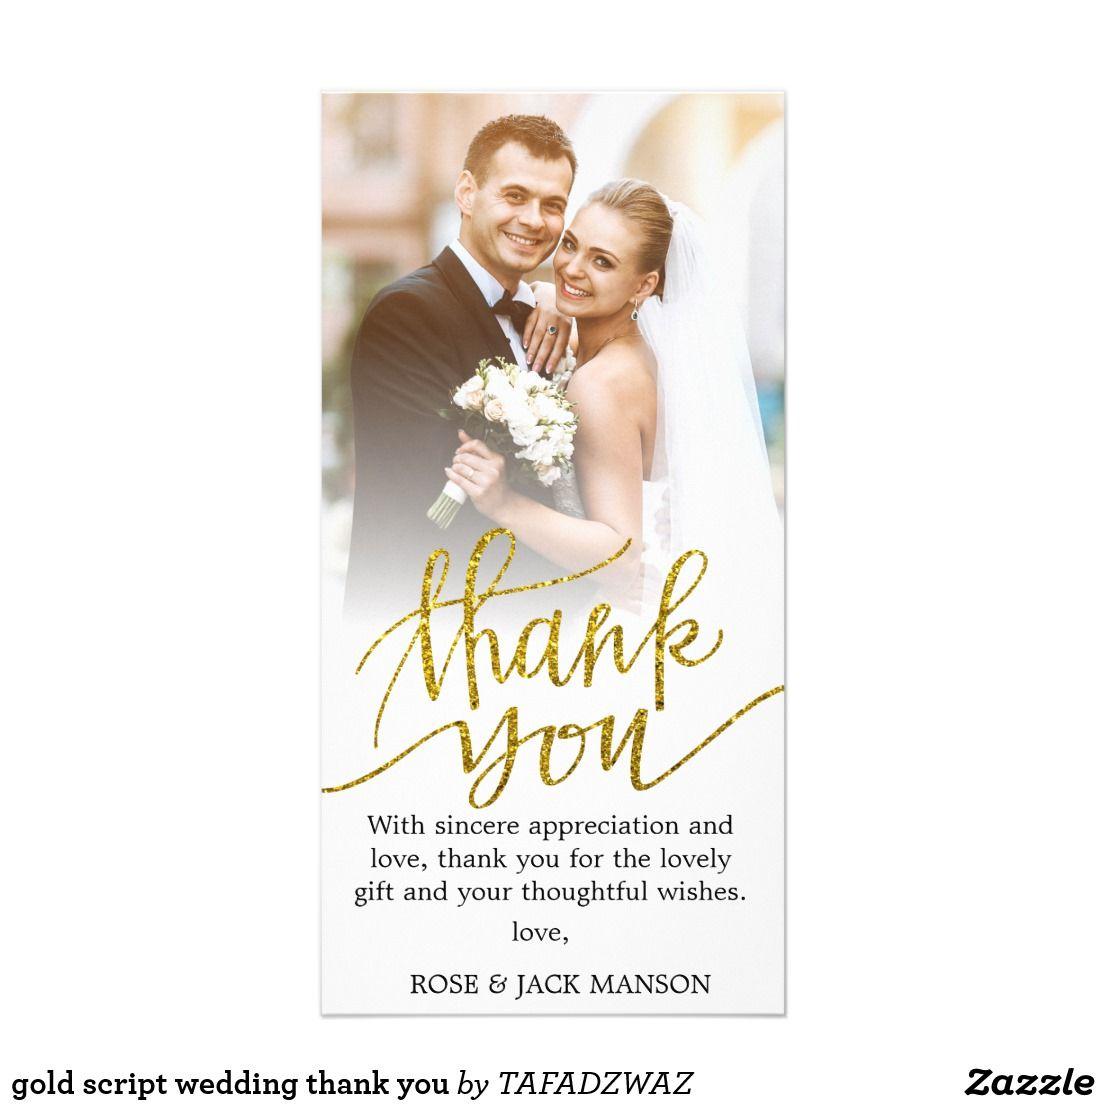 gold script wedding thank you  zazzle  wedding thank